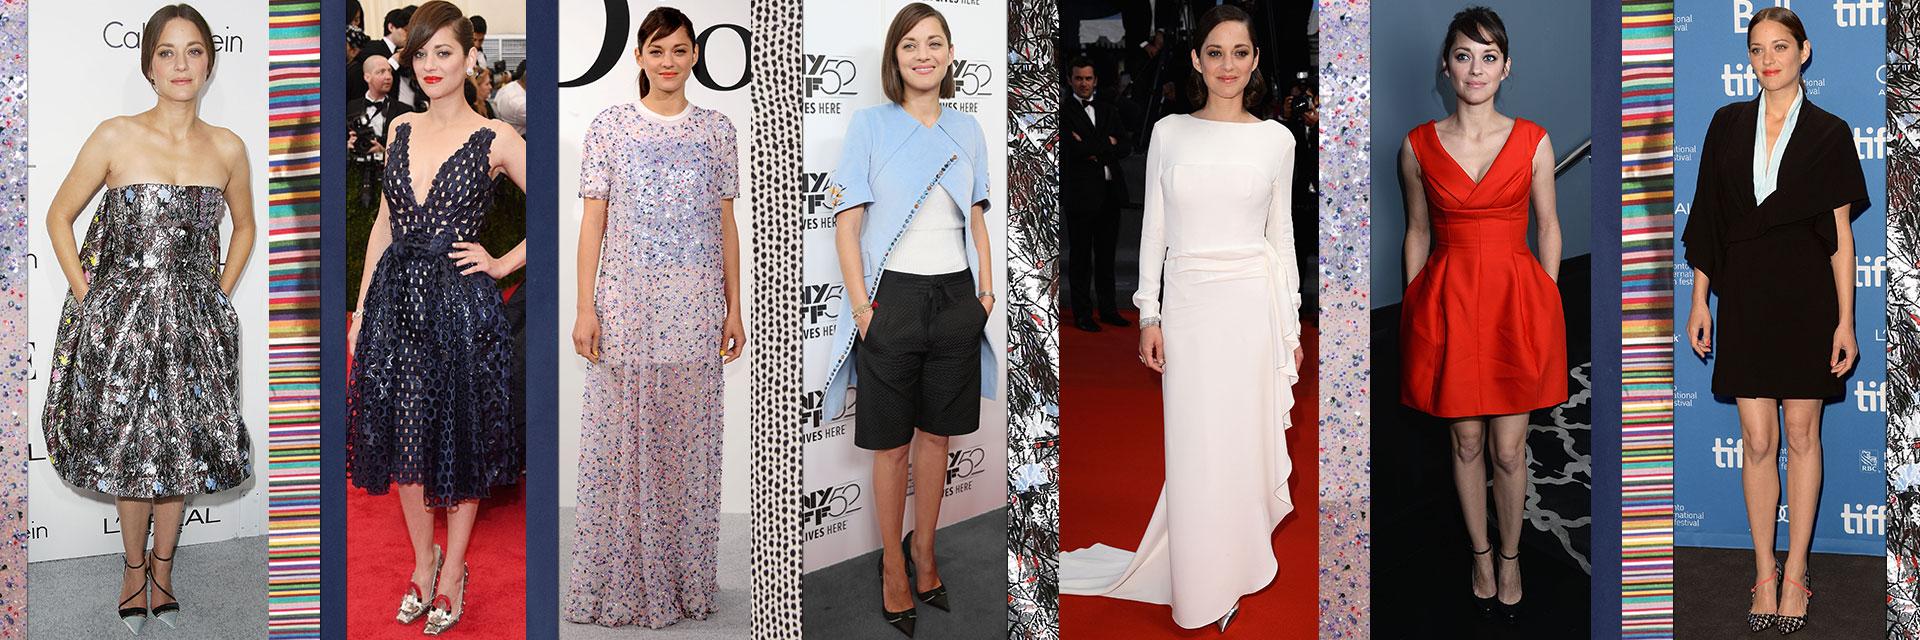 Fashion Paparazzo Marion Cotillard Wide(1)